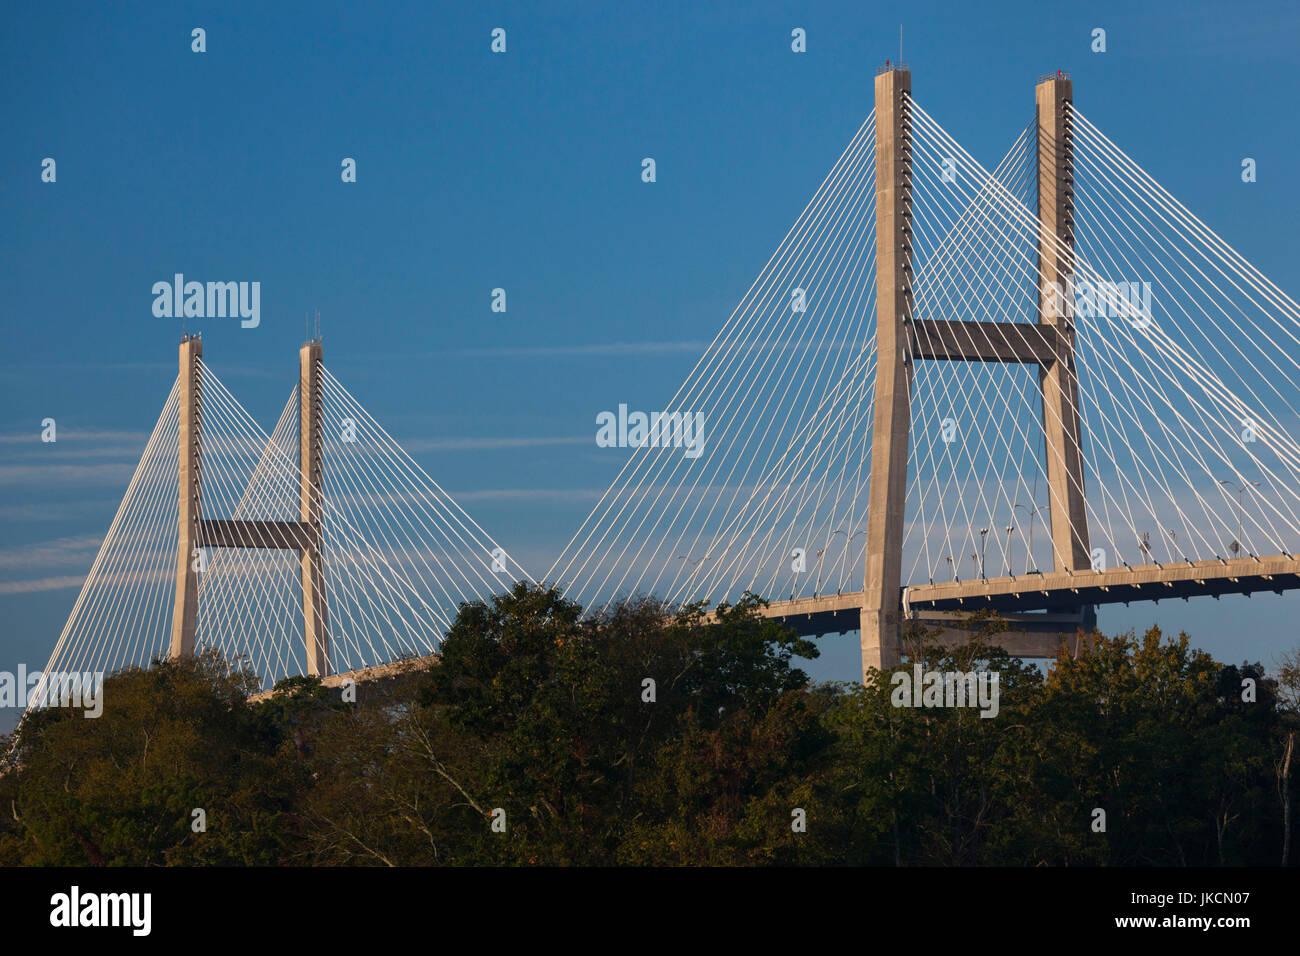 USA, Georgia, Savannah, Eugene Talmadge Memorial Bridge - Stock Image